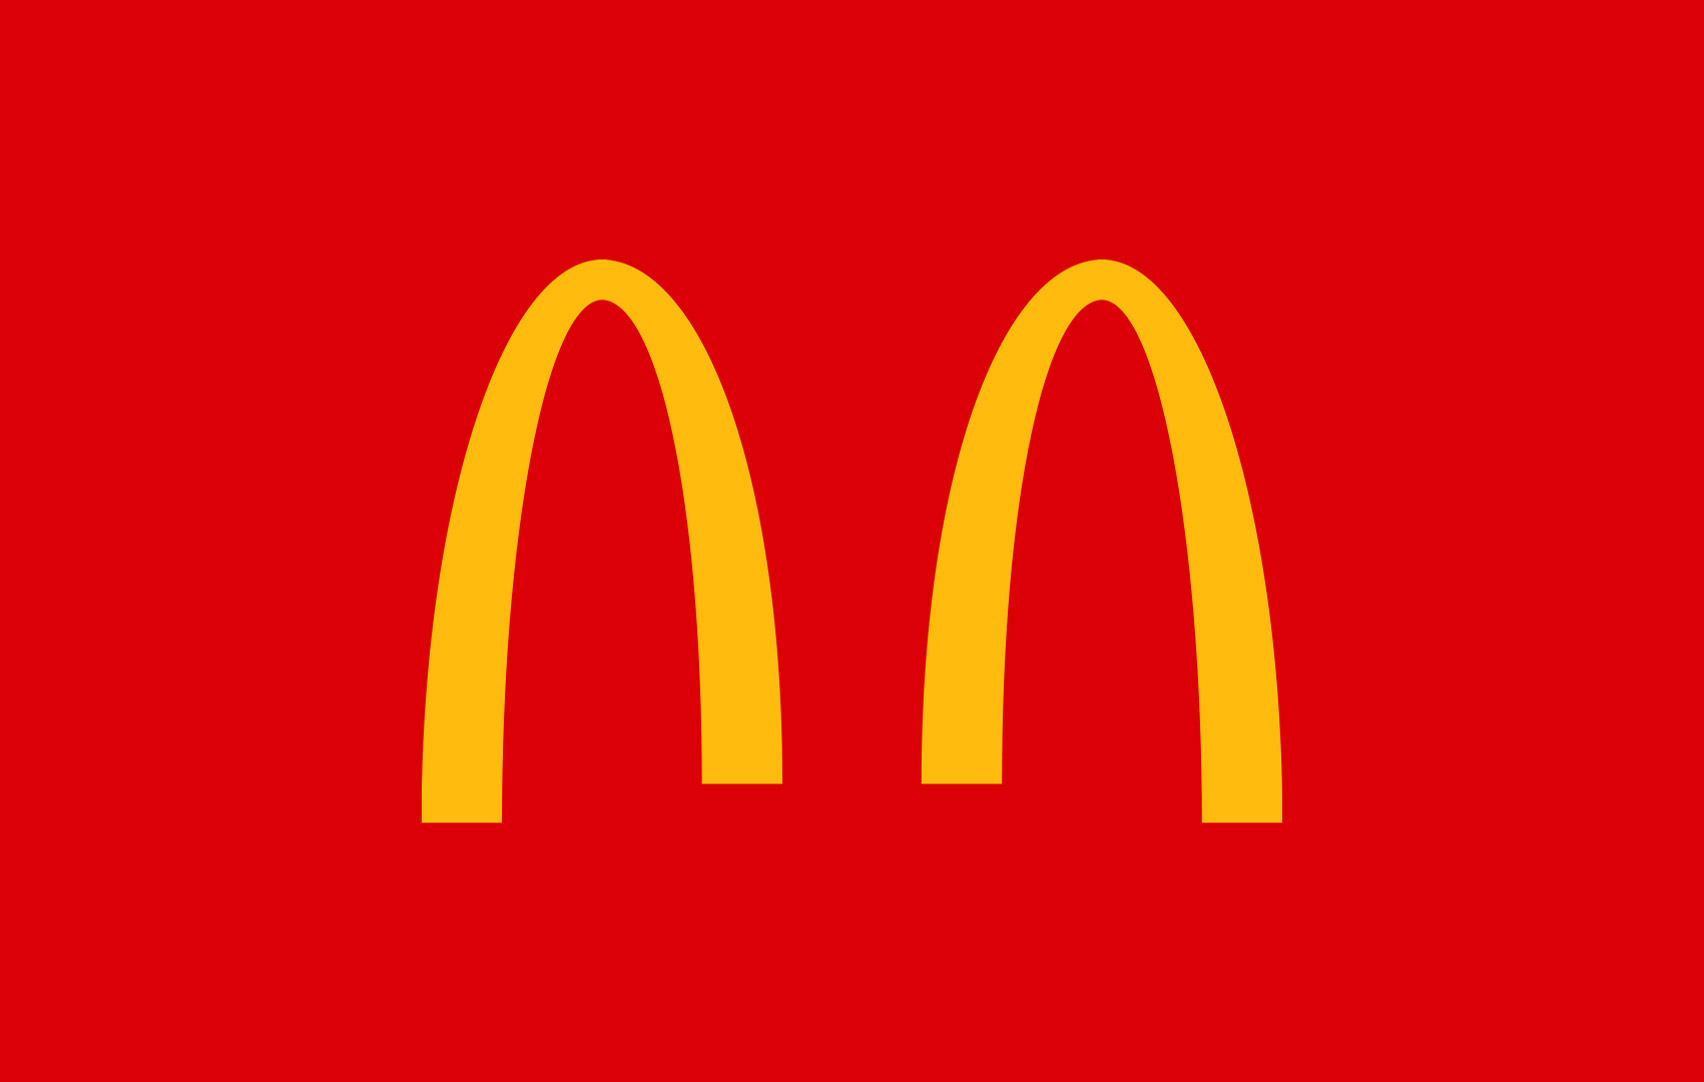 mcdonald's social distancing logo